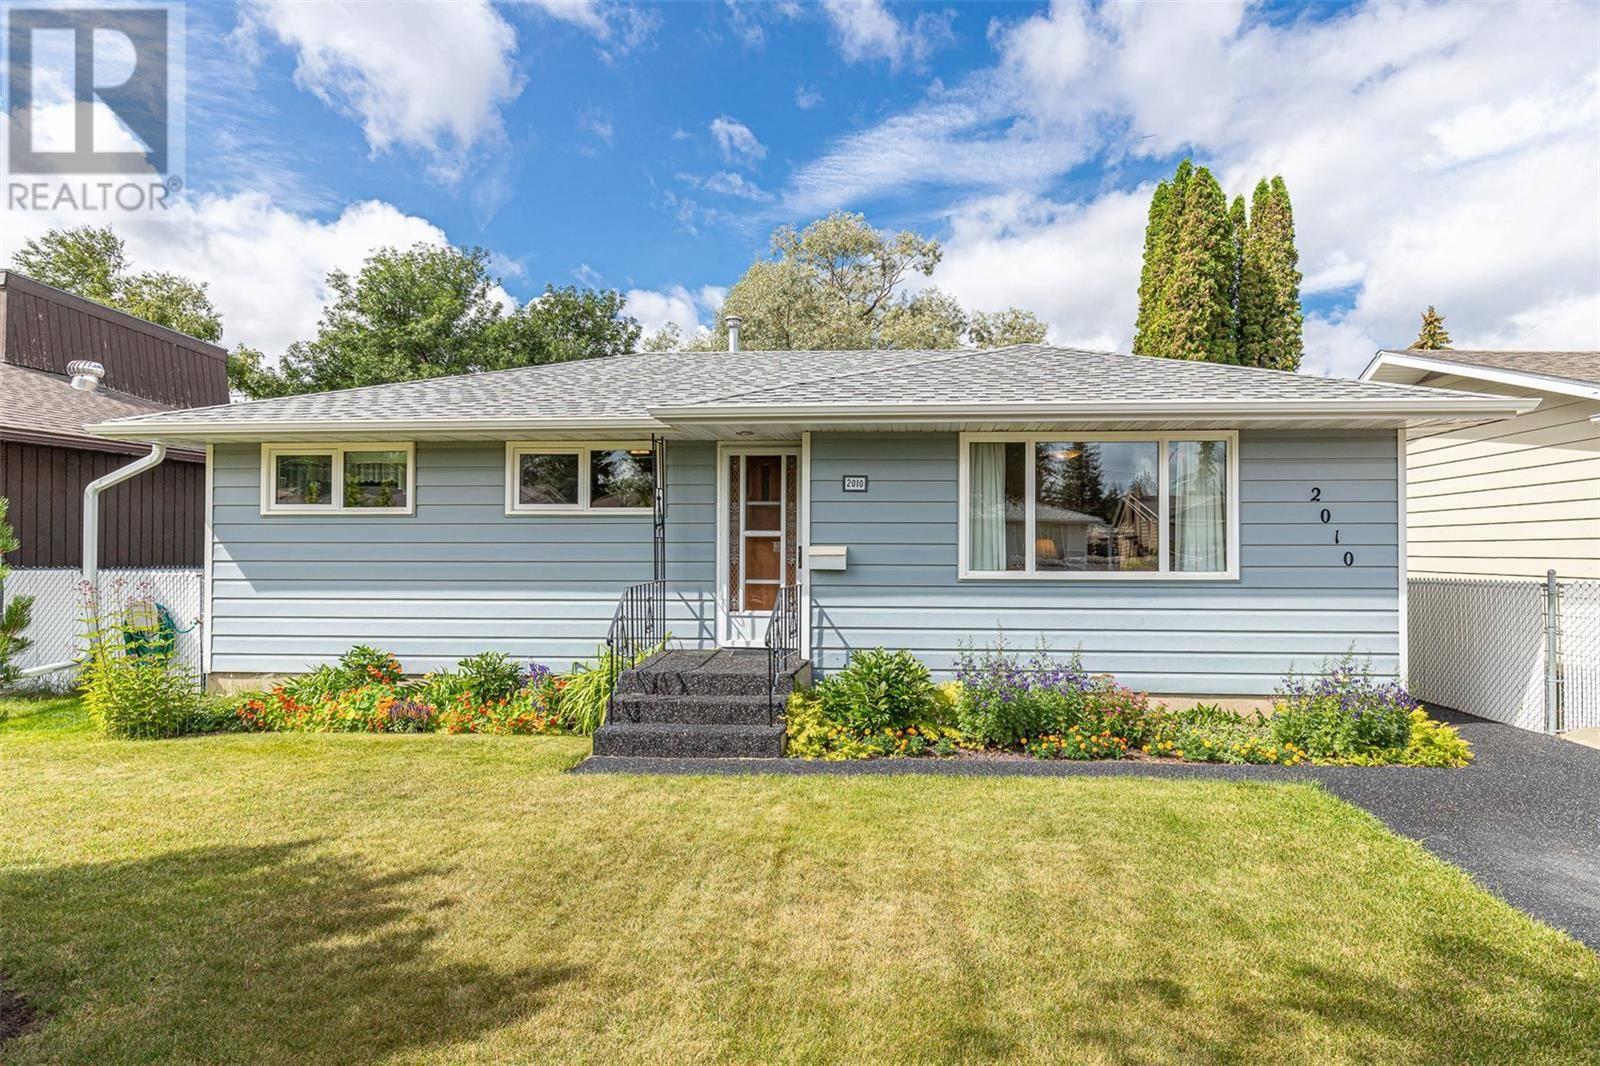 House for sale at 2010 Morgan Ave Saskatoon Saskatchewan - MLS: SK784088